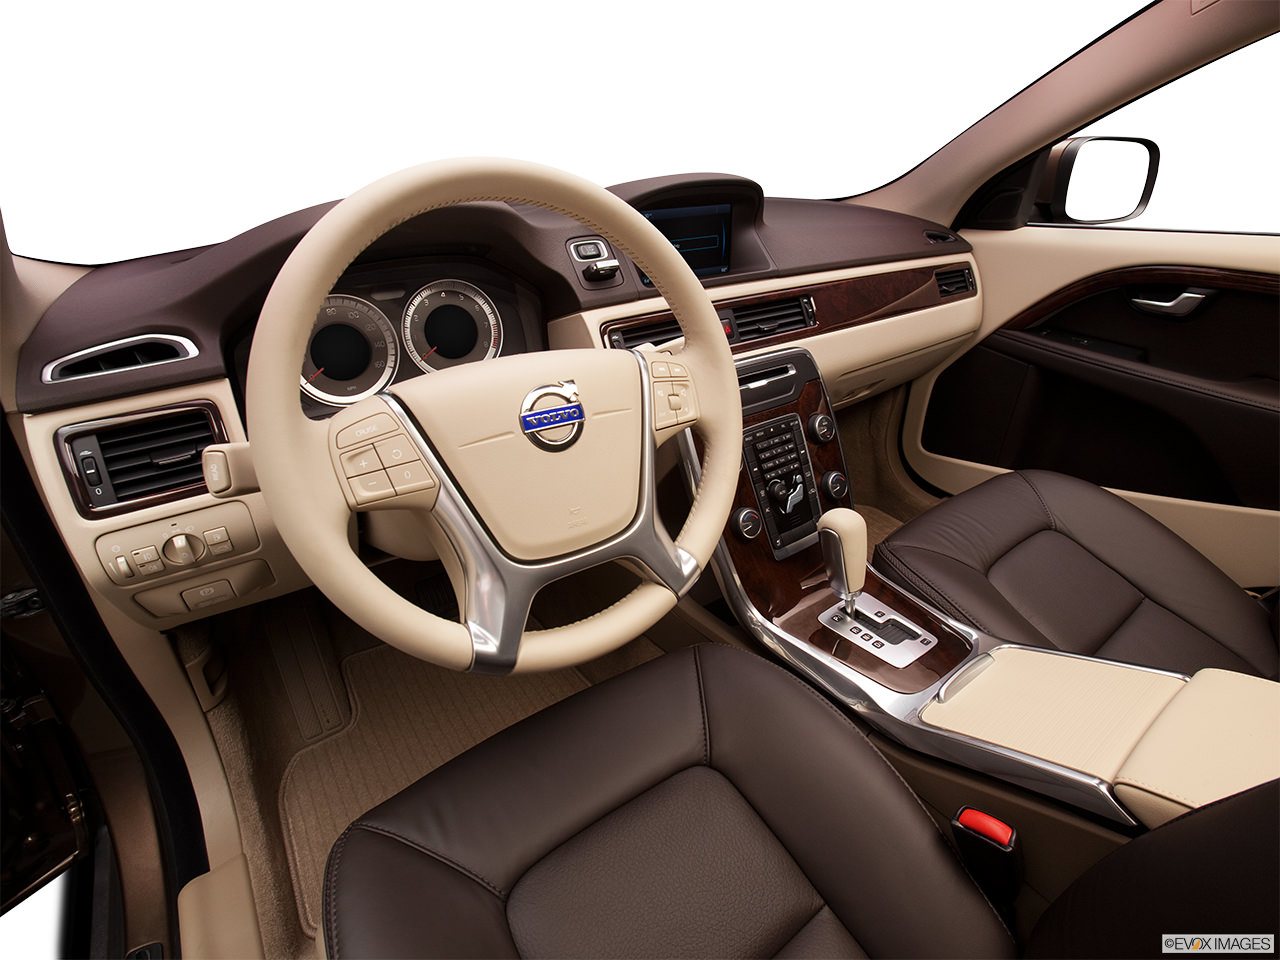 Volvo XC70 2012 Interior